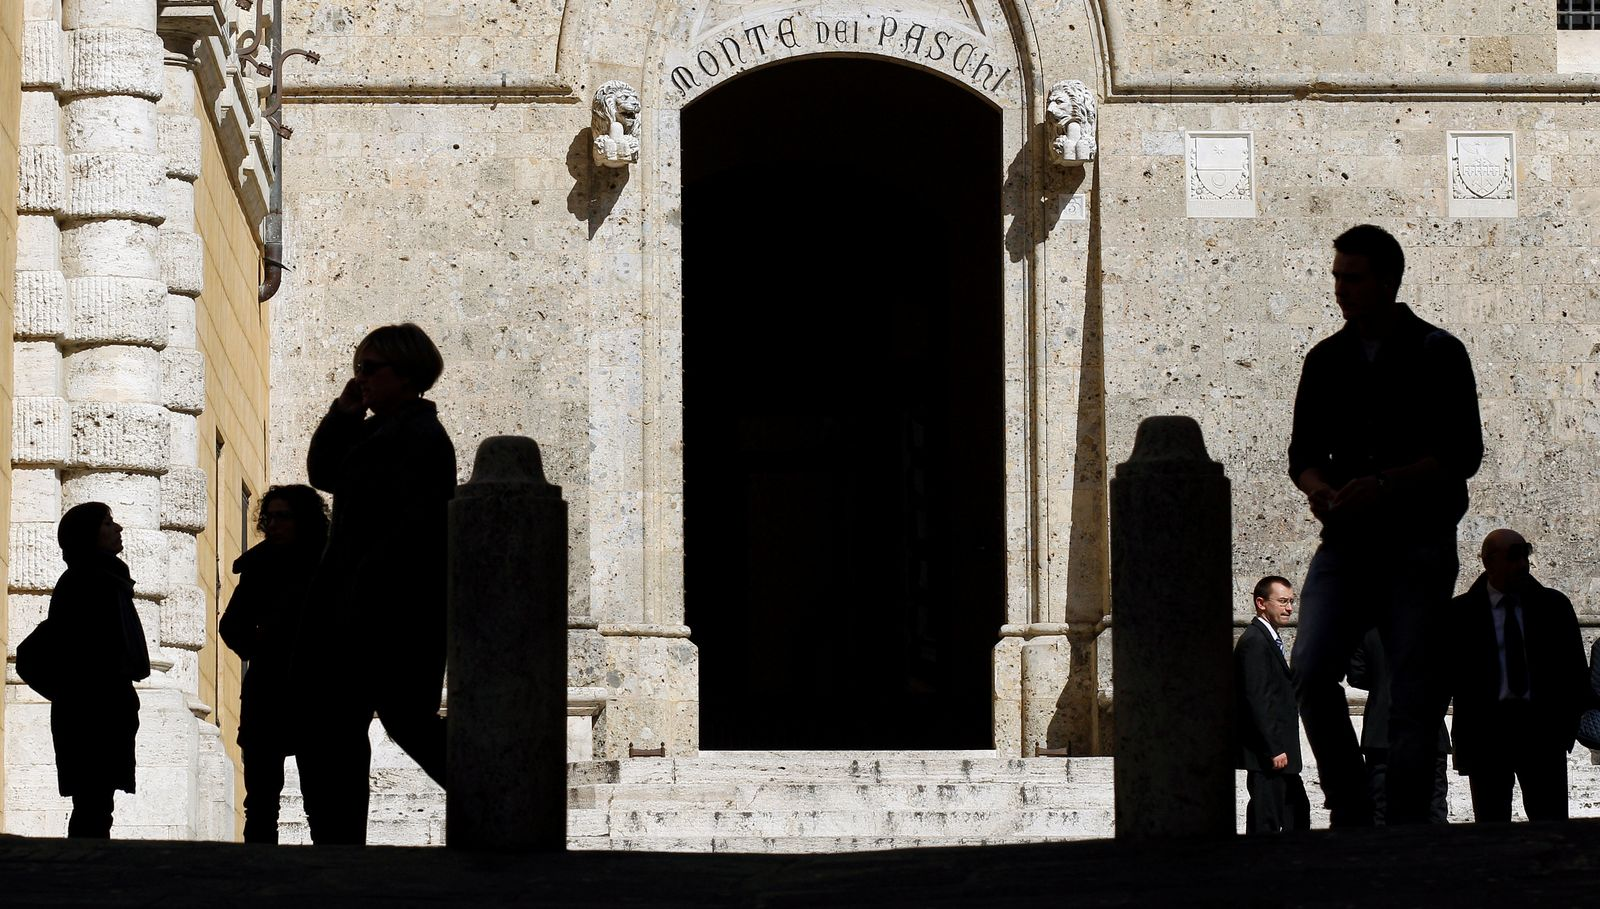 Siena/ Monte dei Paschi